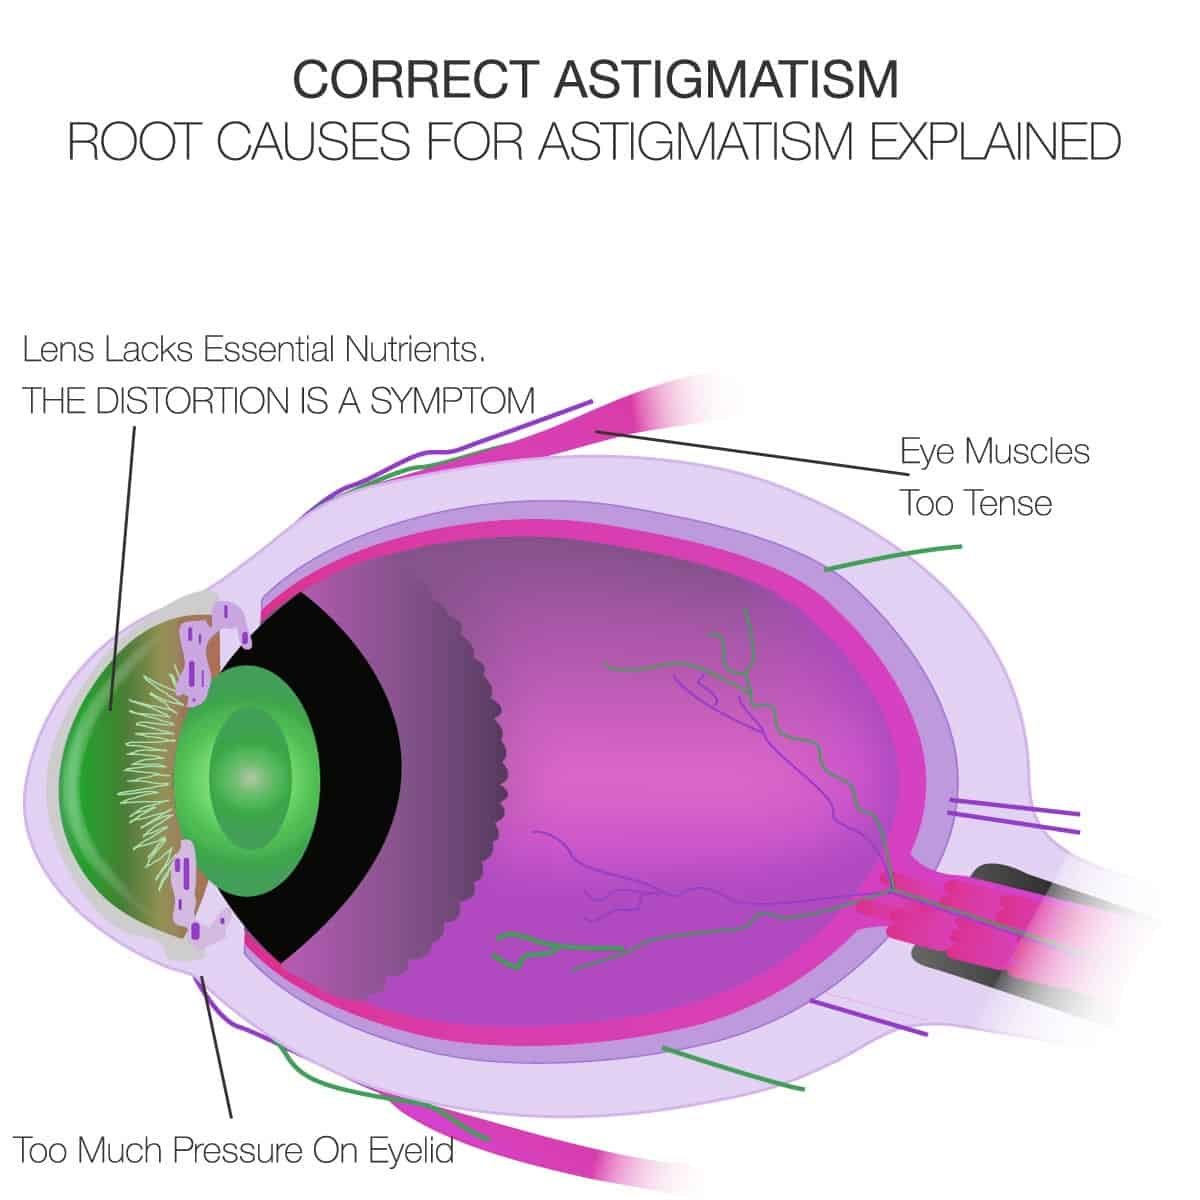 Correct Astigmatism